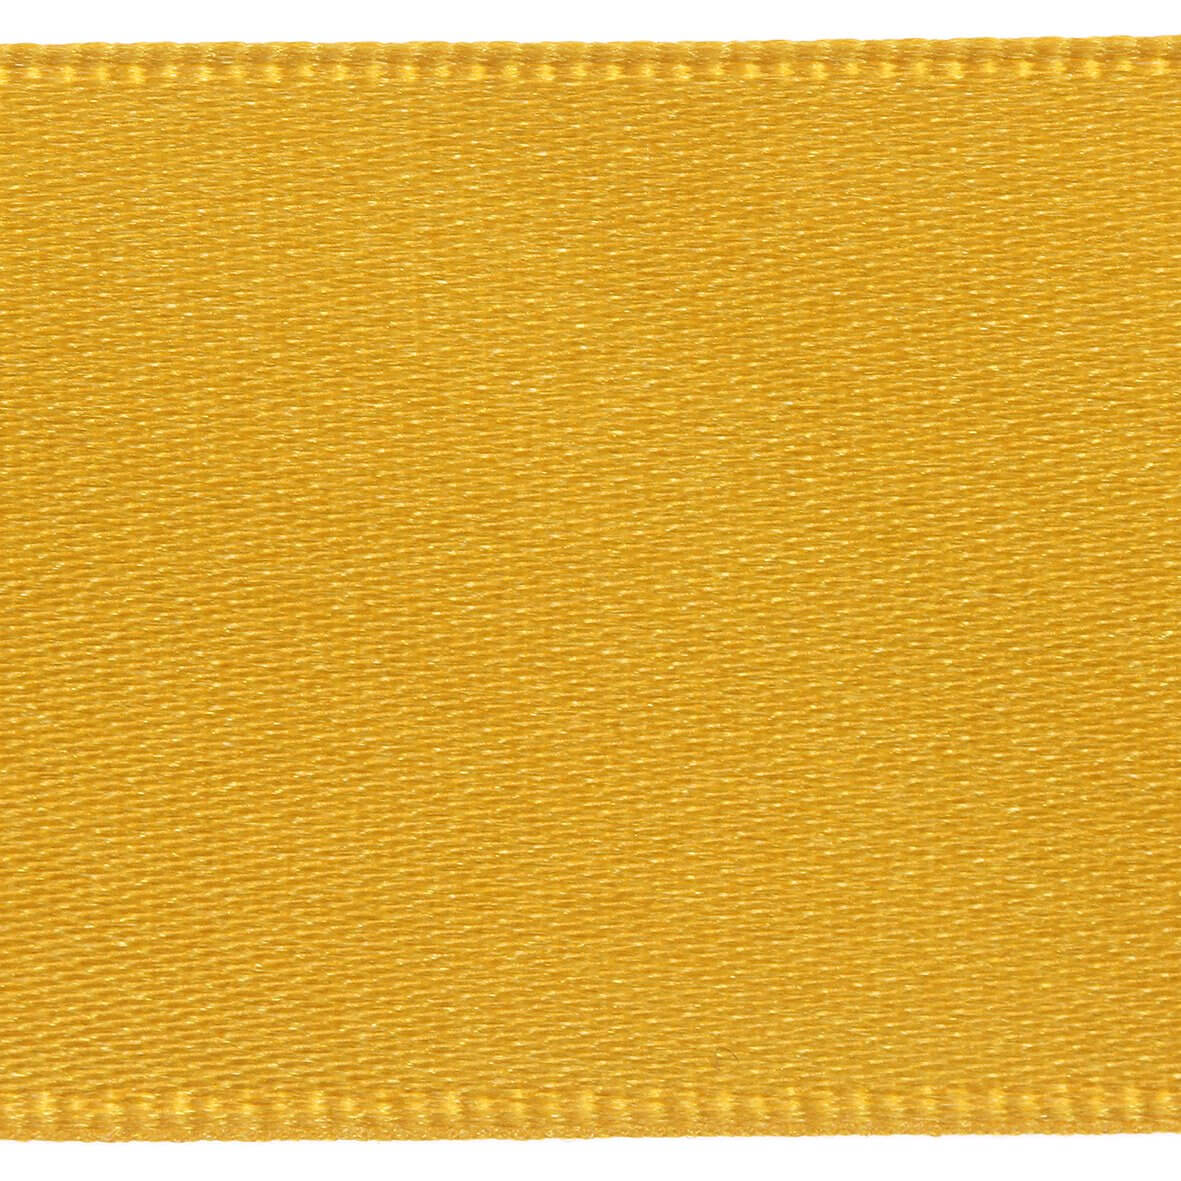 10mm Berisfords Satin Ribbon - Topaz Colour 412